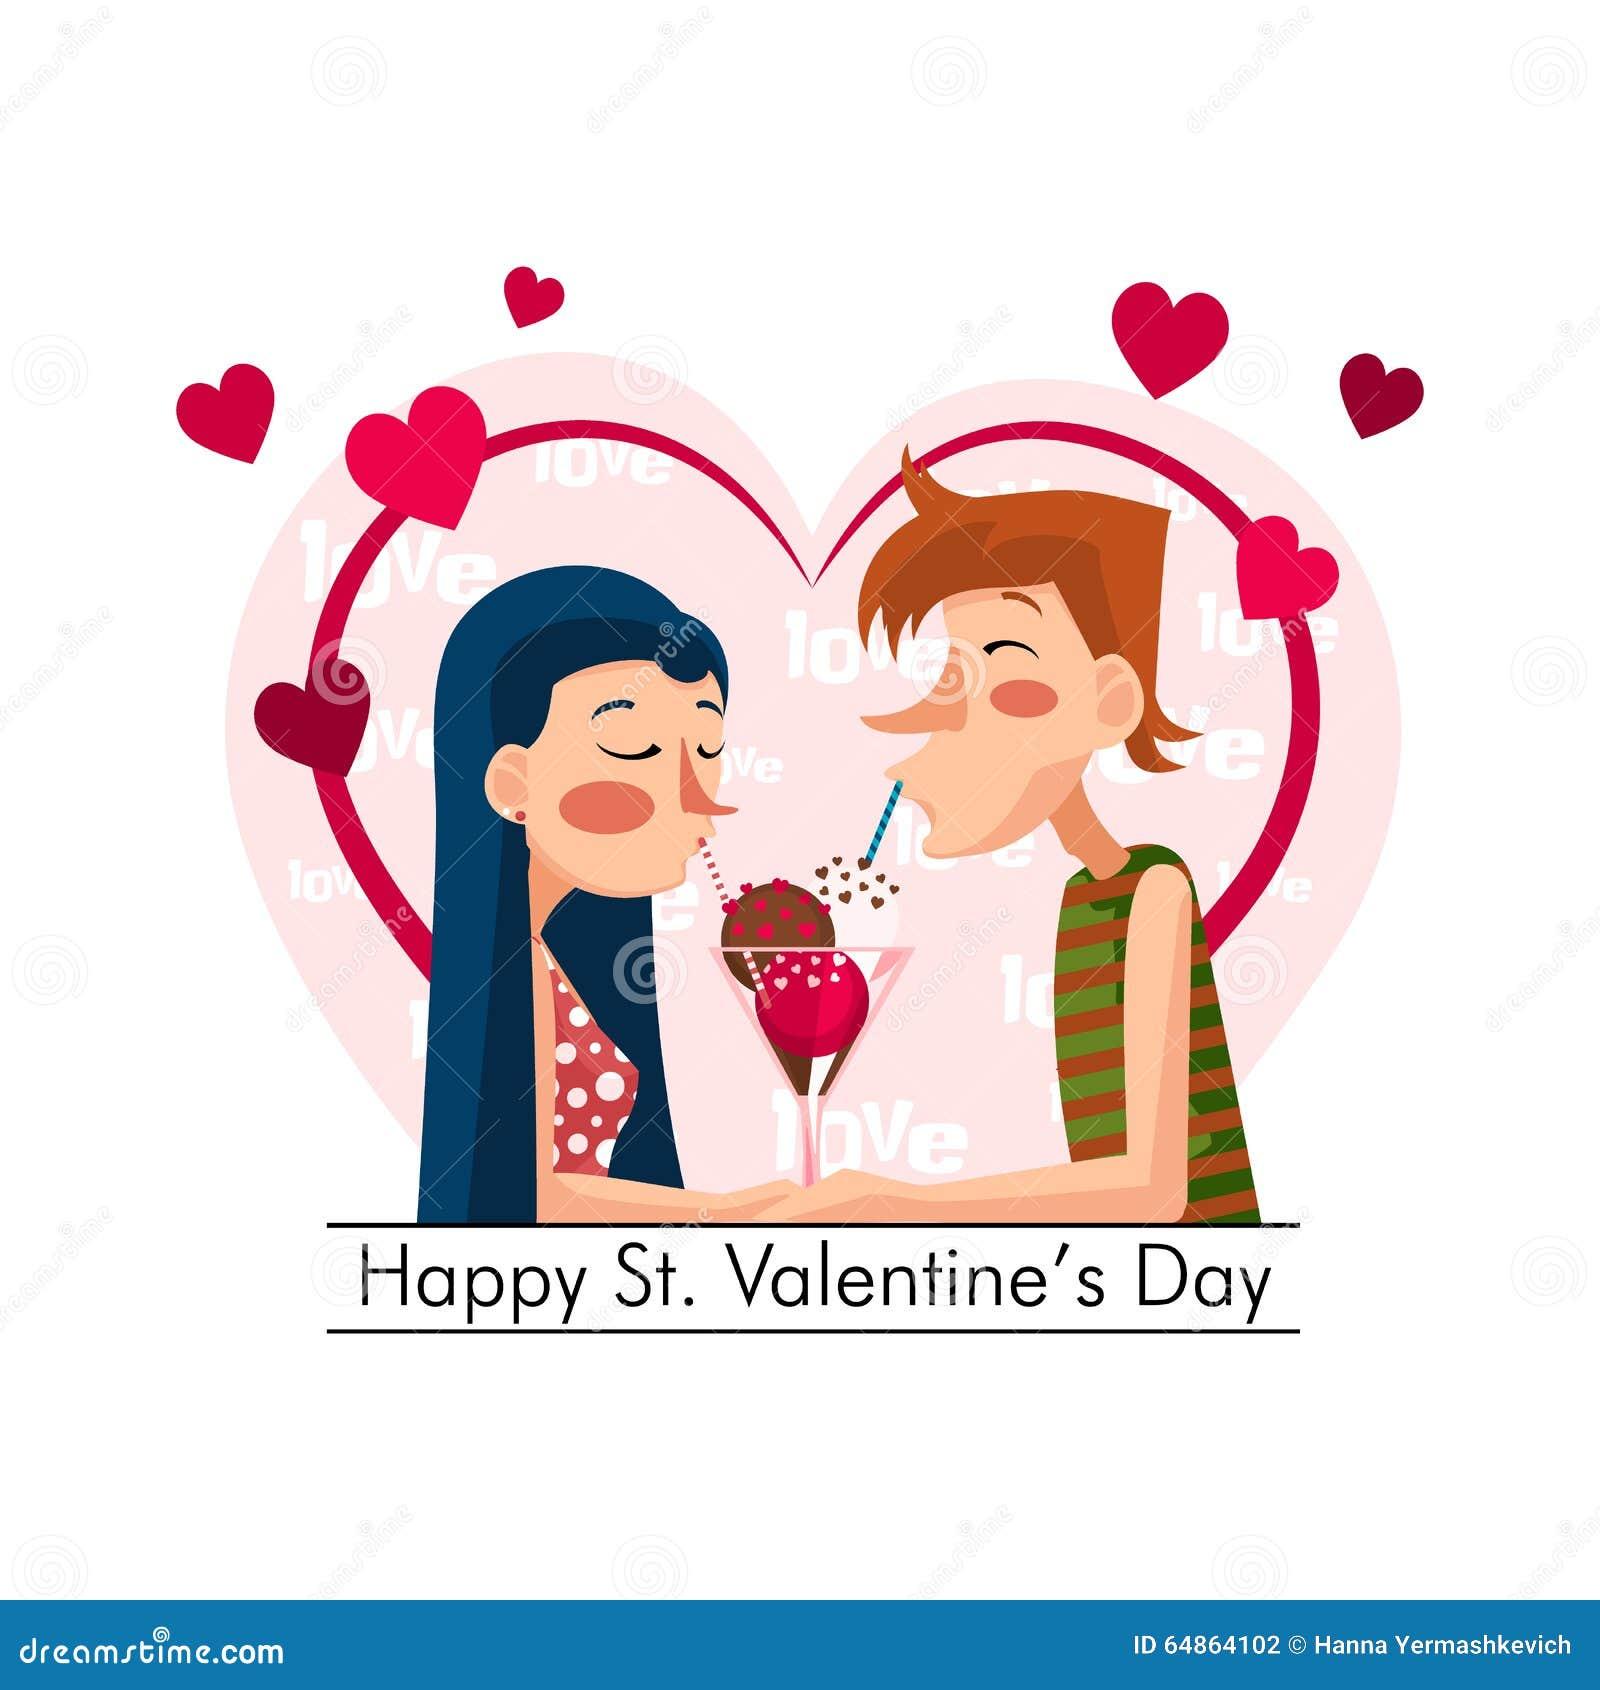 Valentine Haiku